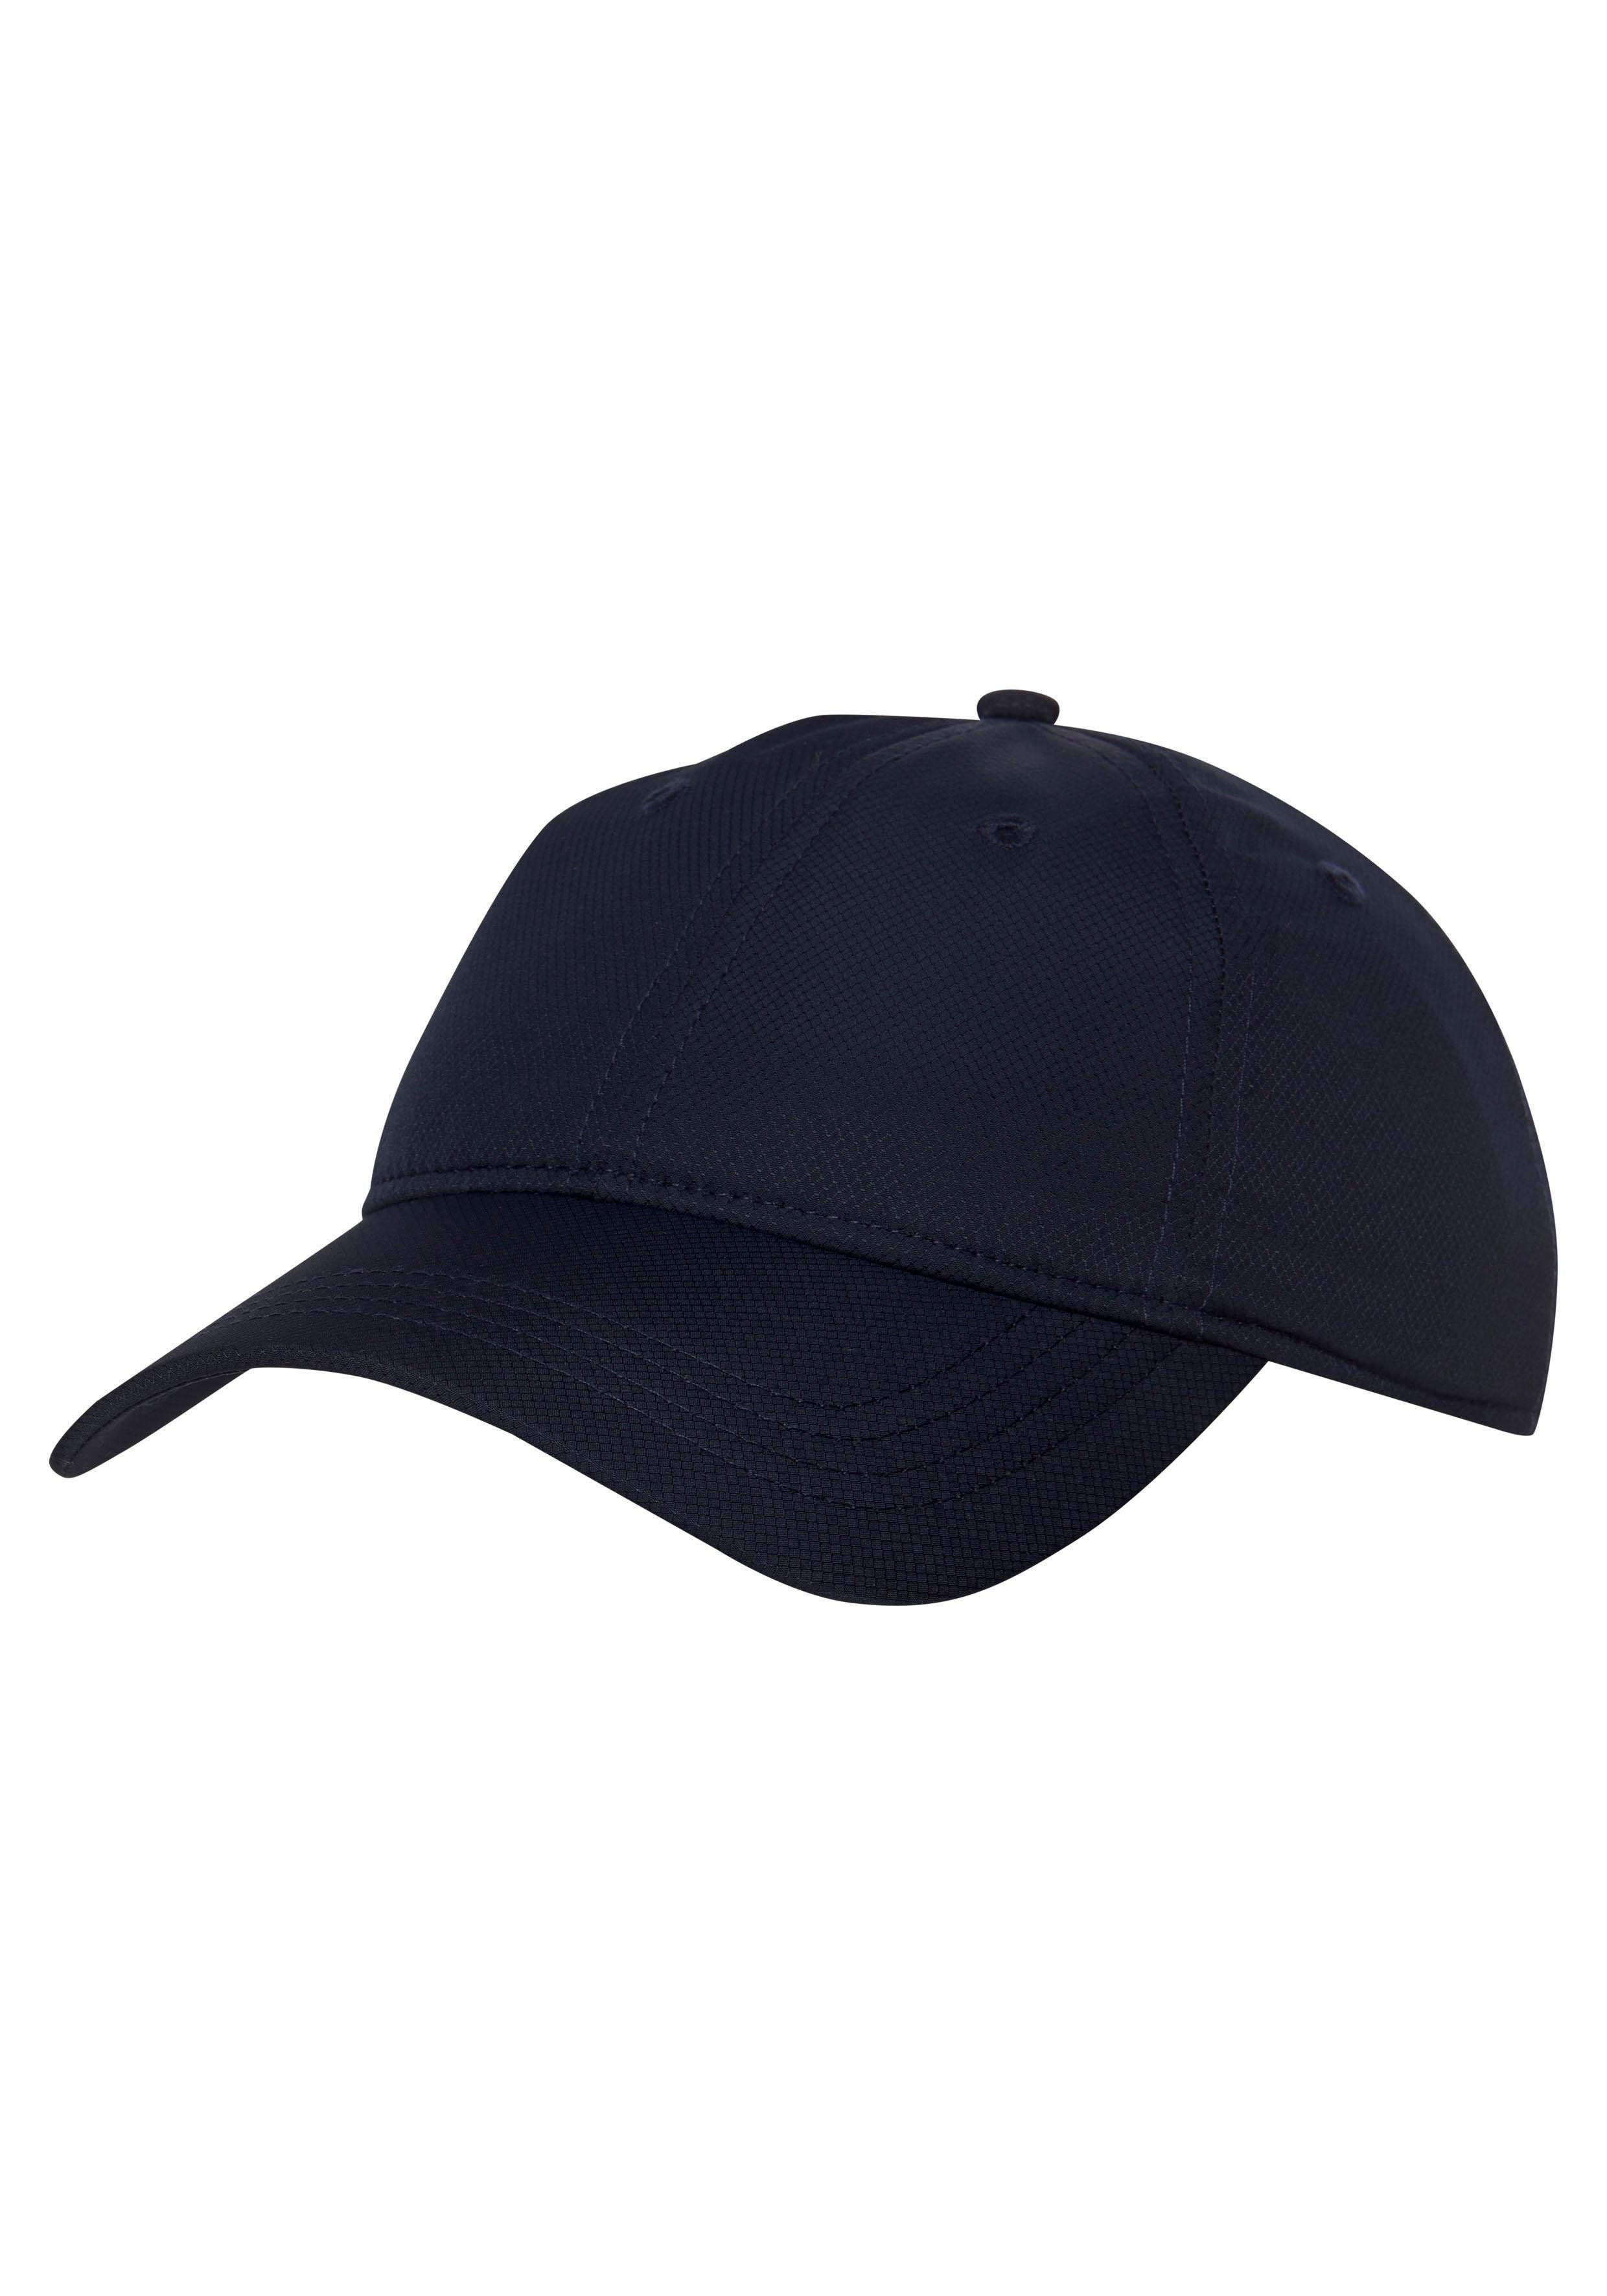 LACOSTE baseballcap - verschillende betaalmethodes